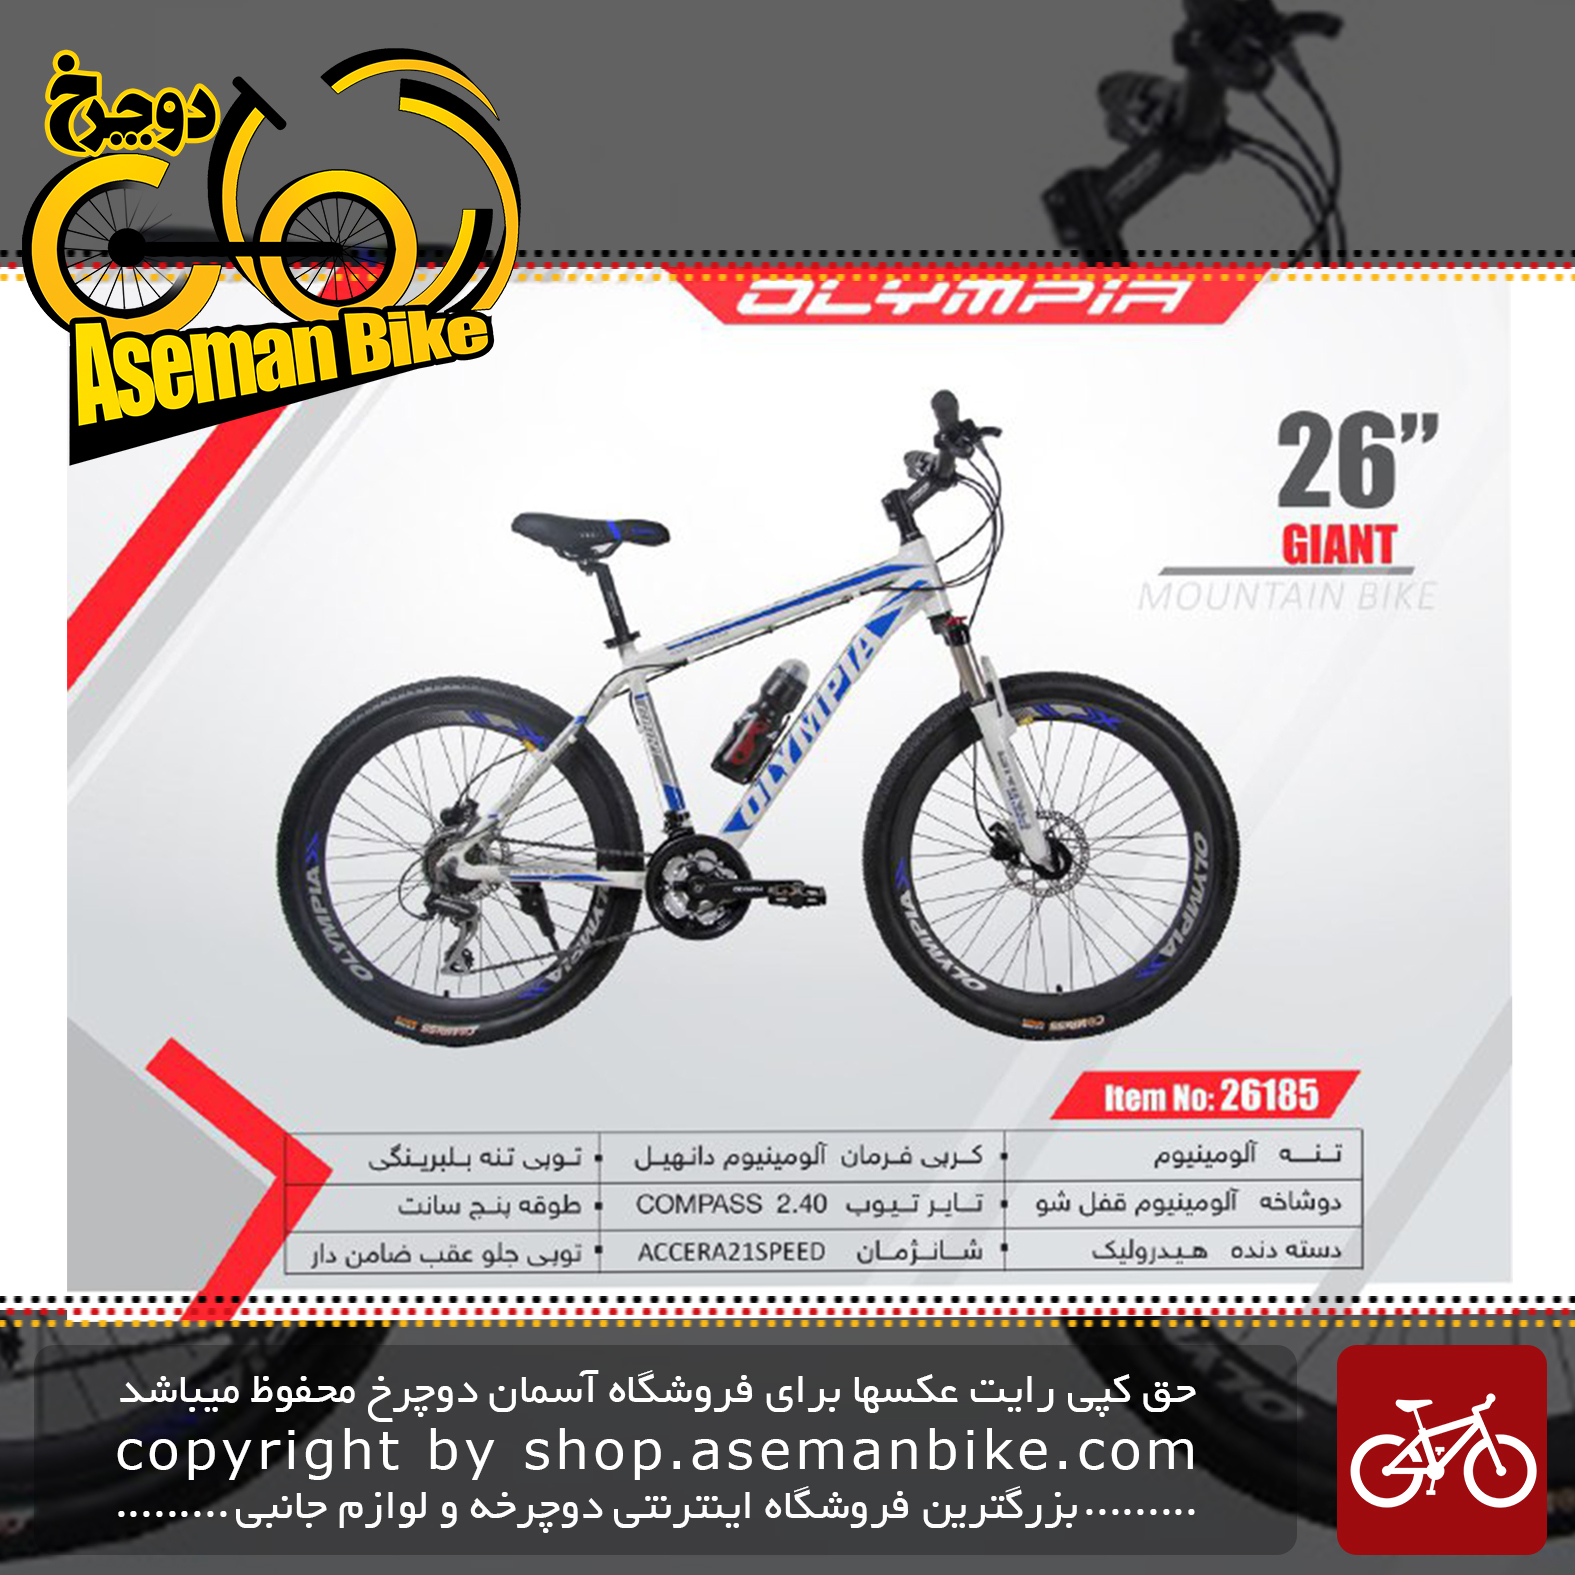 دوچرخه کوهستان المپیا سایز 26مدل گیانت OLYMPIA SIZE 26 GIANT